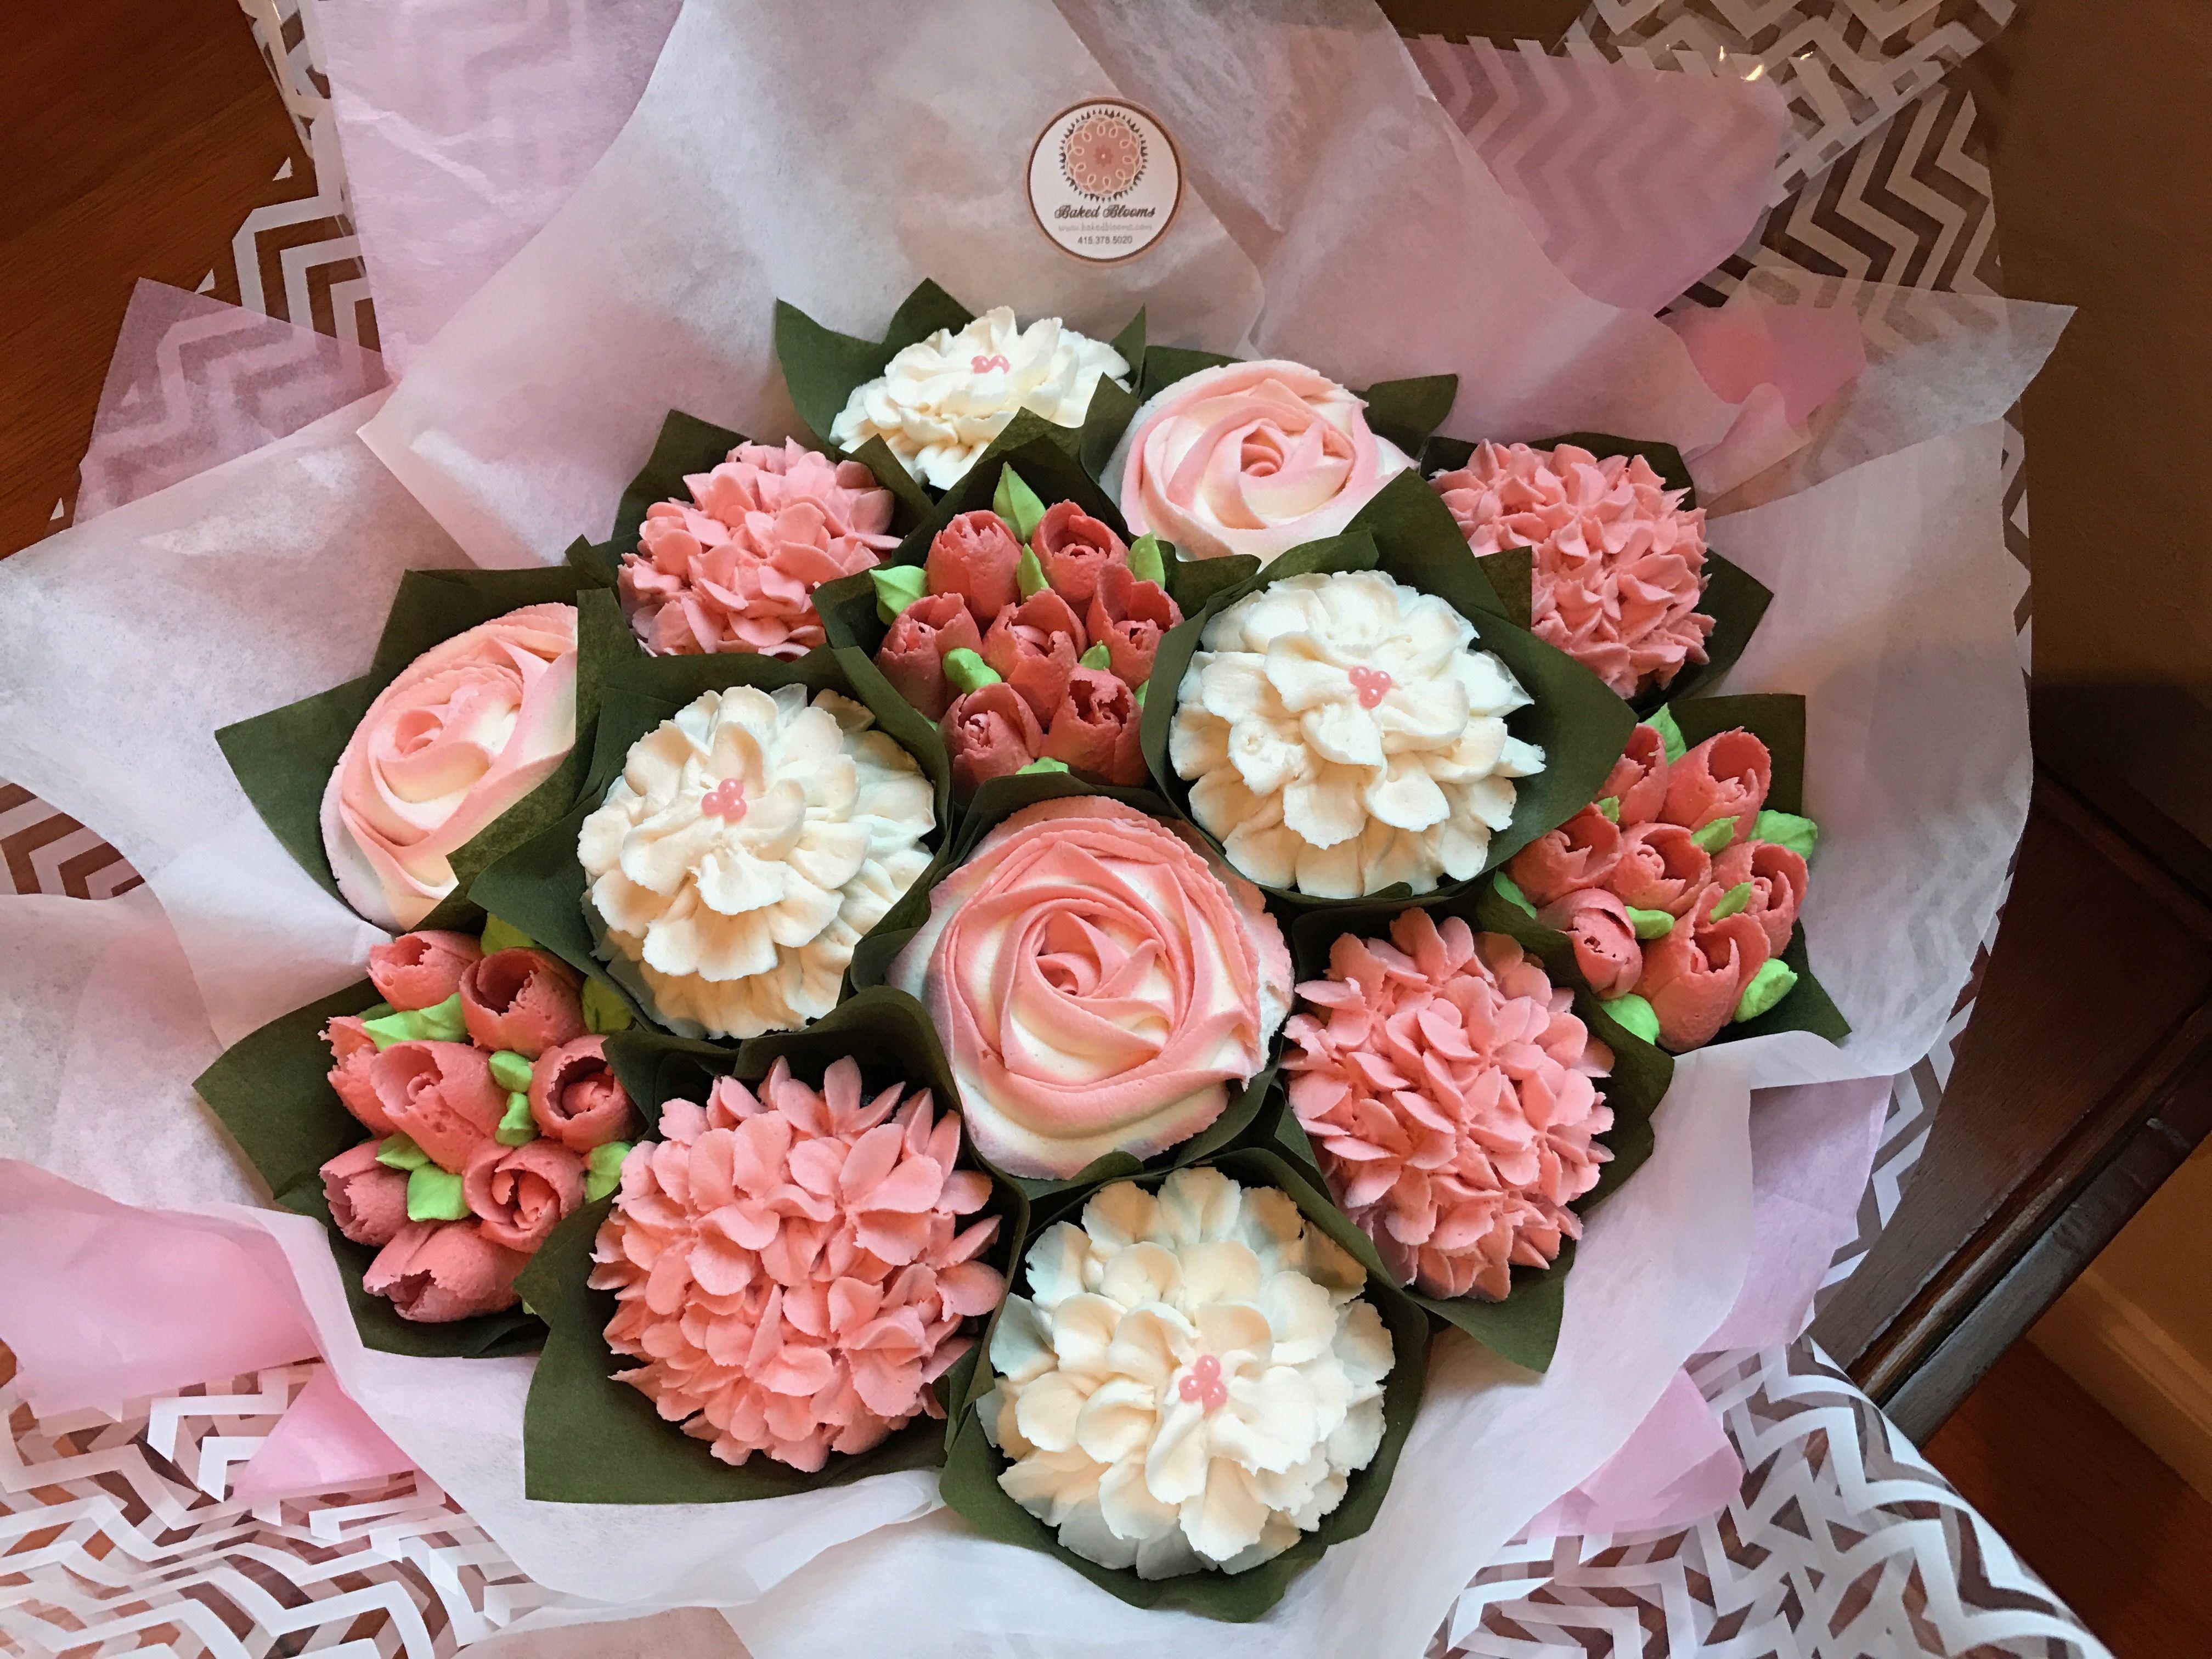 Medium pink cupcake bouquet bakedblooms baked blooms medium pink cupcake bouquet bakedblooms izmirmasajfo